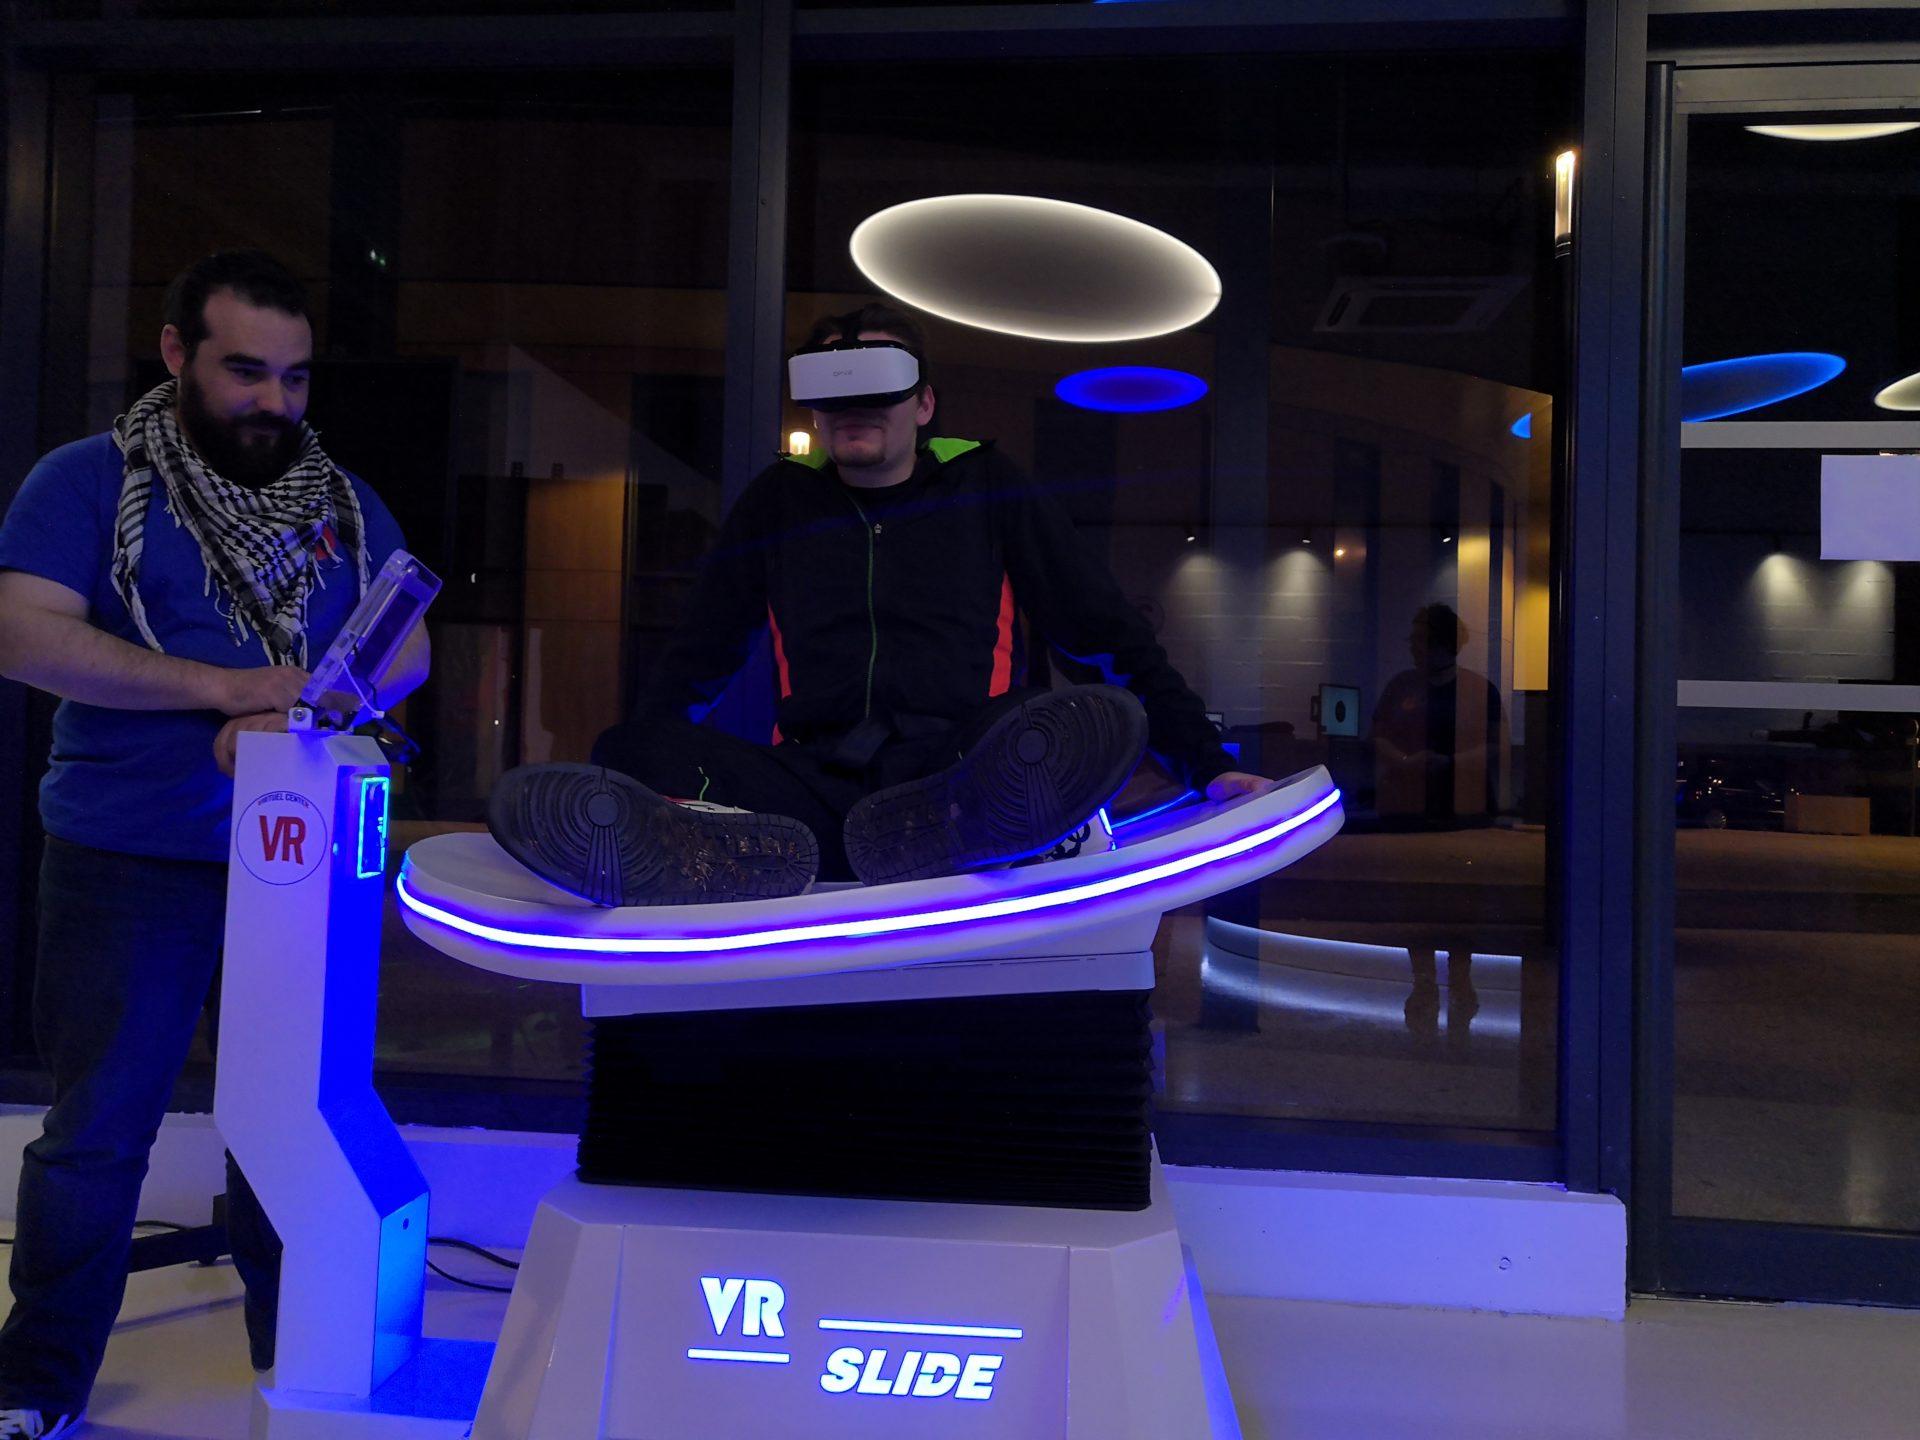 Attraction VR Slide